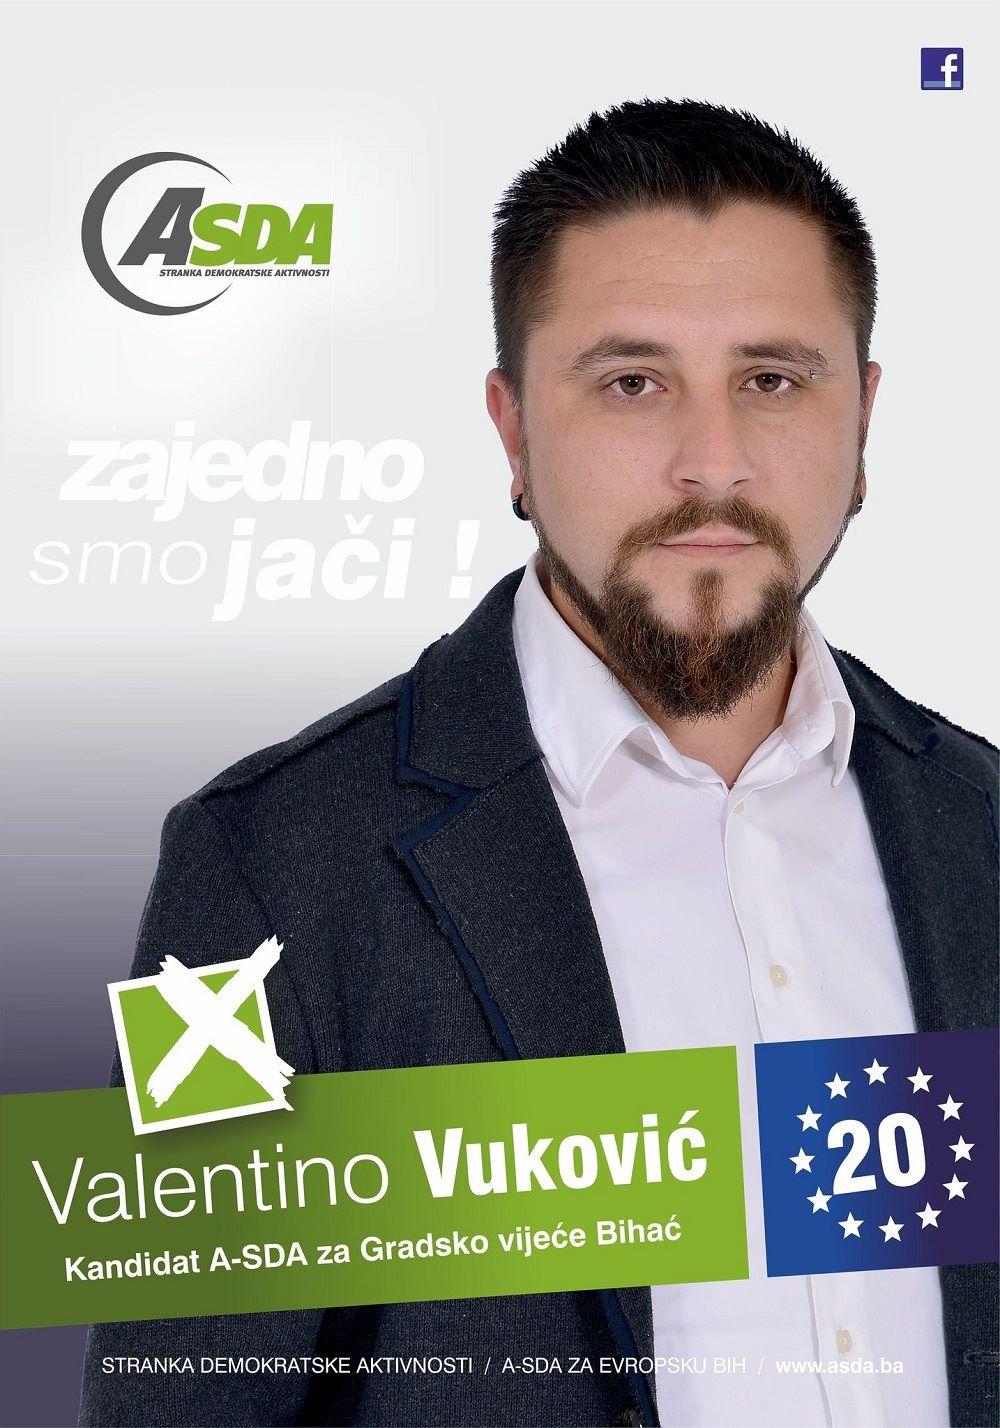 Valentino Vuković